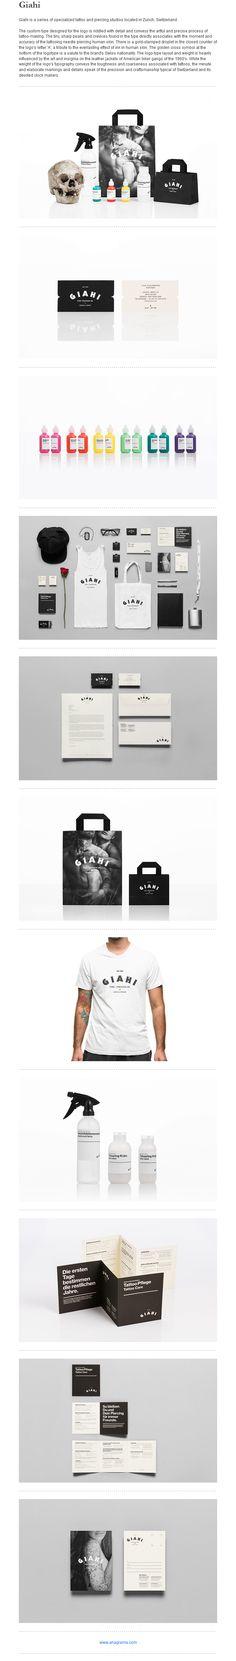 Giahi // Tattoo Switzerland   #stationary #corporate #design #corporatedesign #logo #identity #branding #marketing <<< repinned by an #advertising agency from #Hamburg / #Germany - www.BlickeDeeler.de   Follow us on www.facebook.com/BlickeDeeler